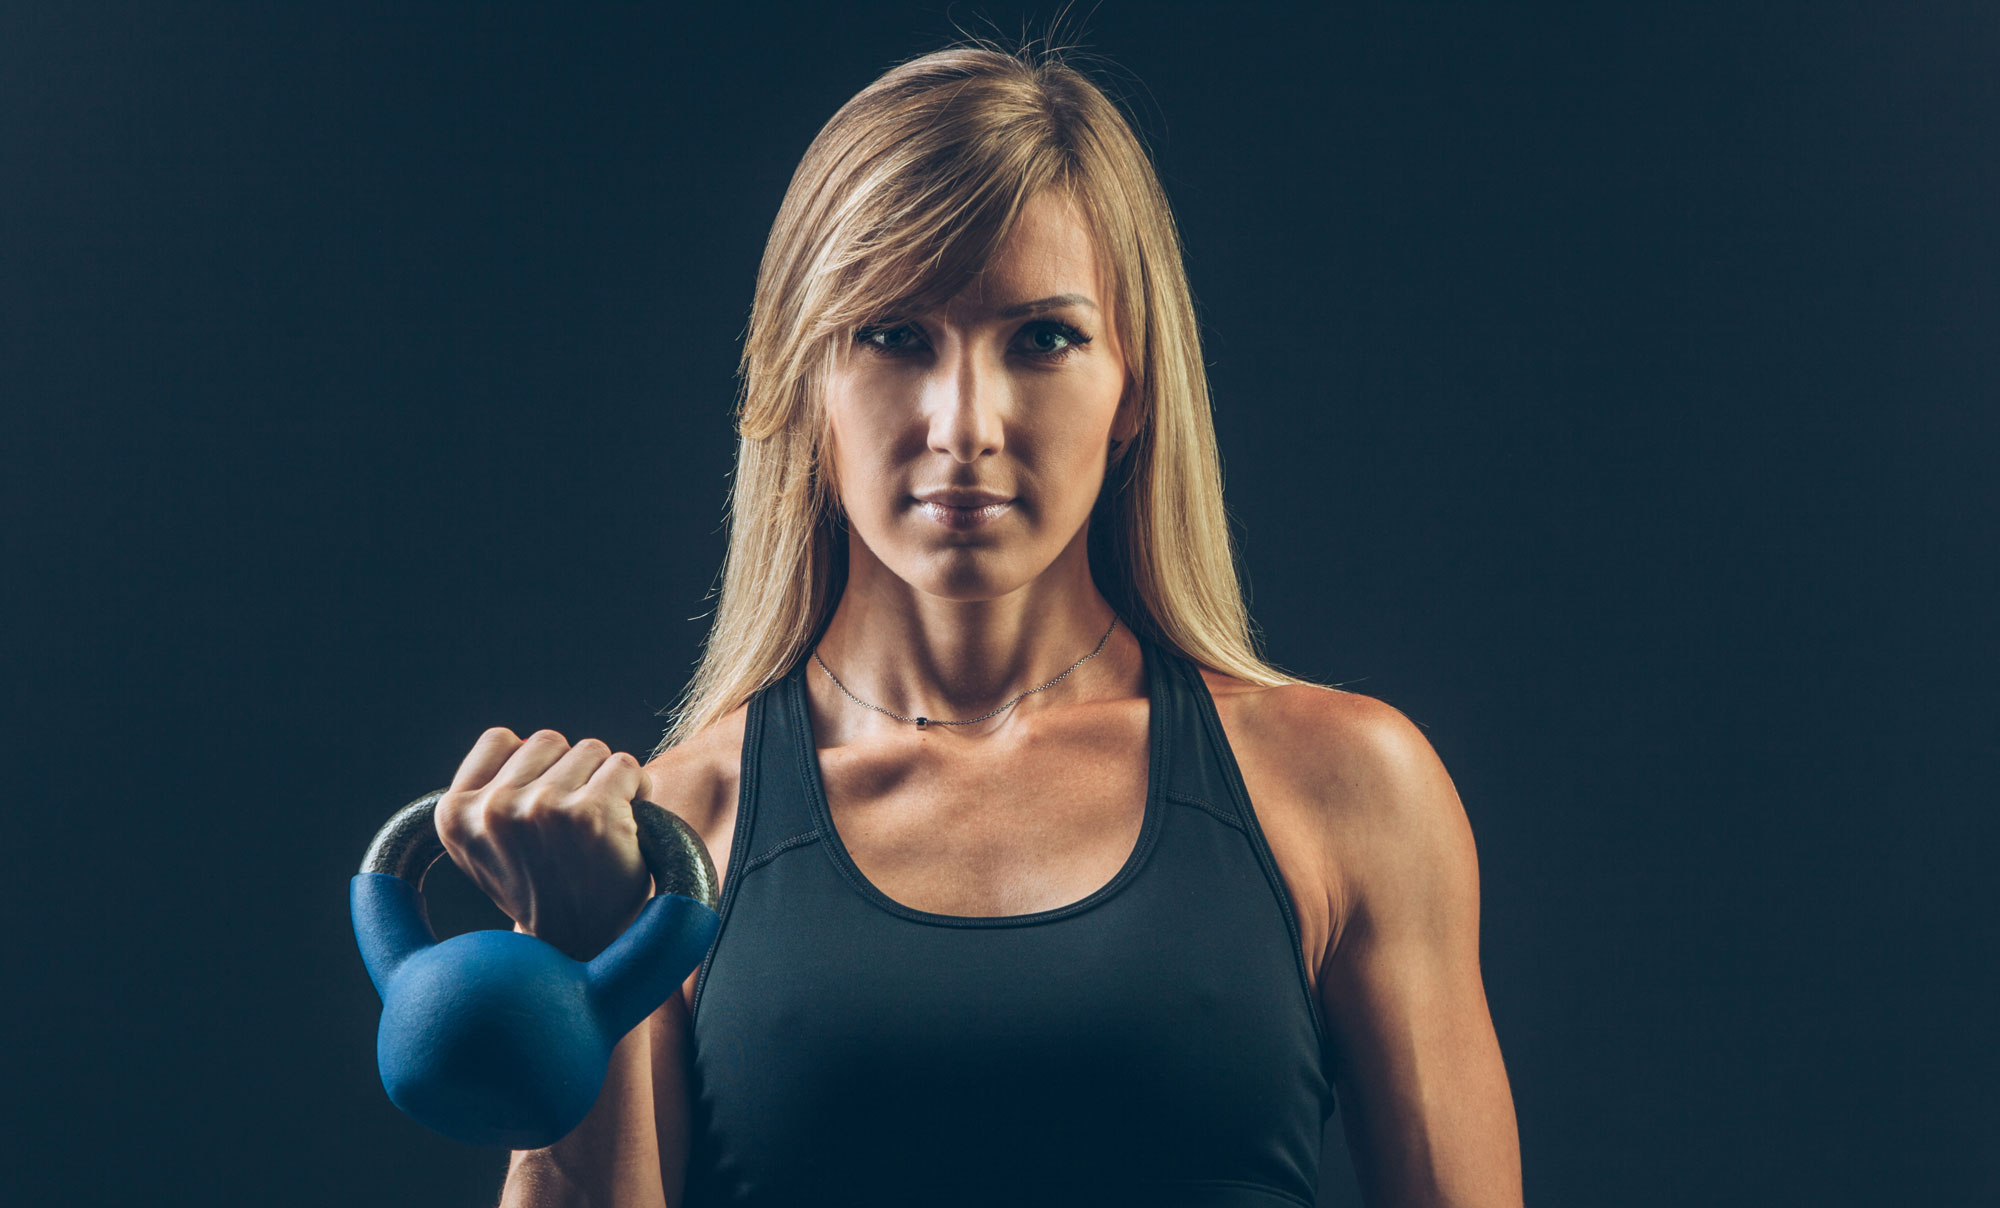 workout model